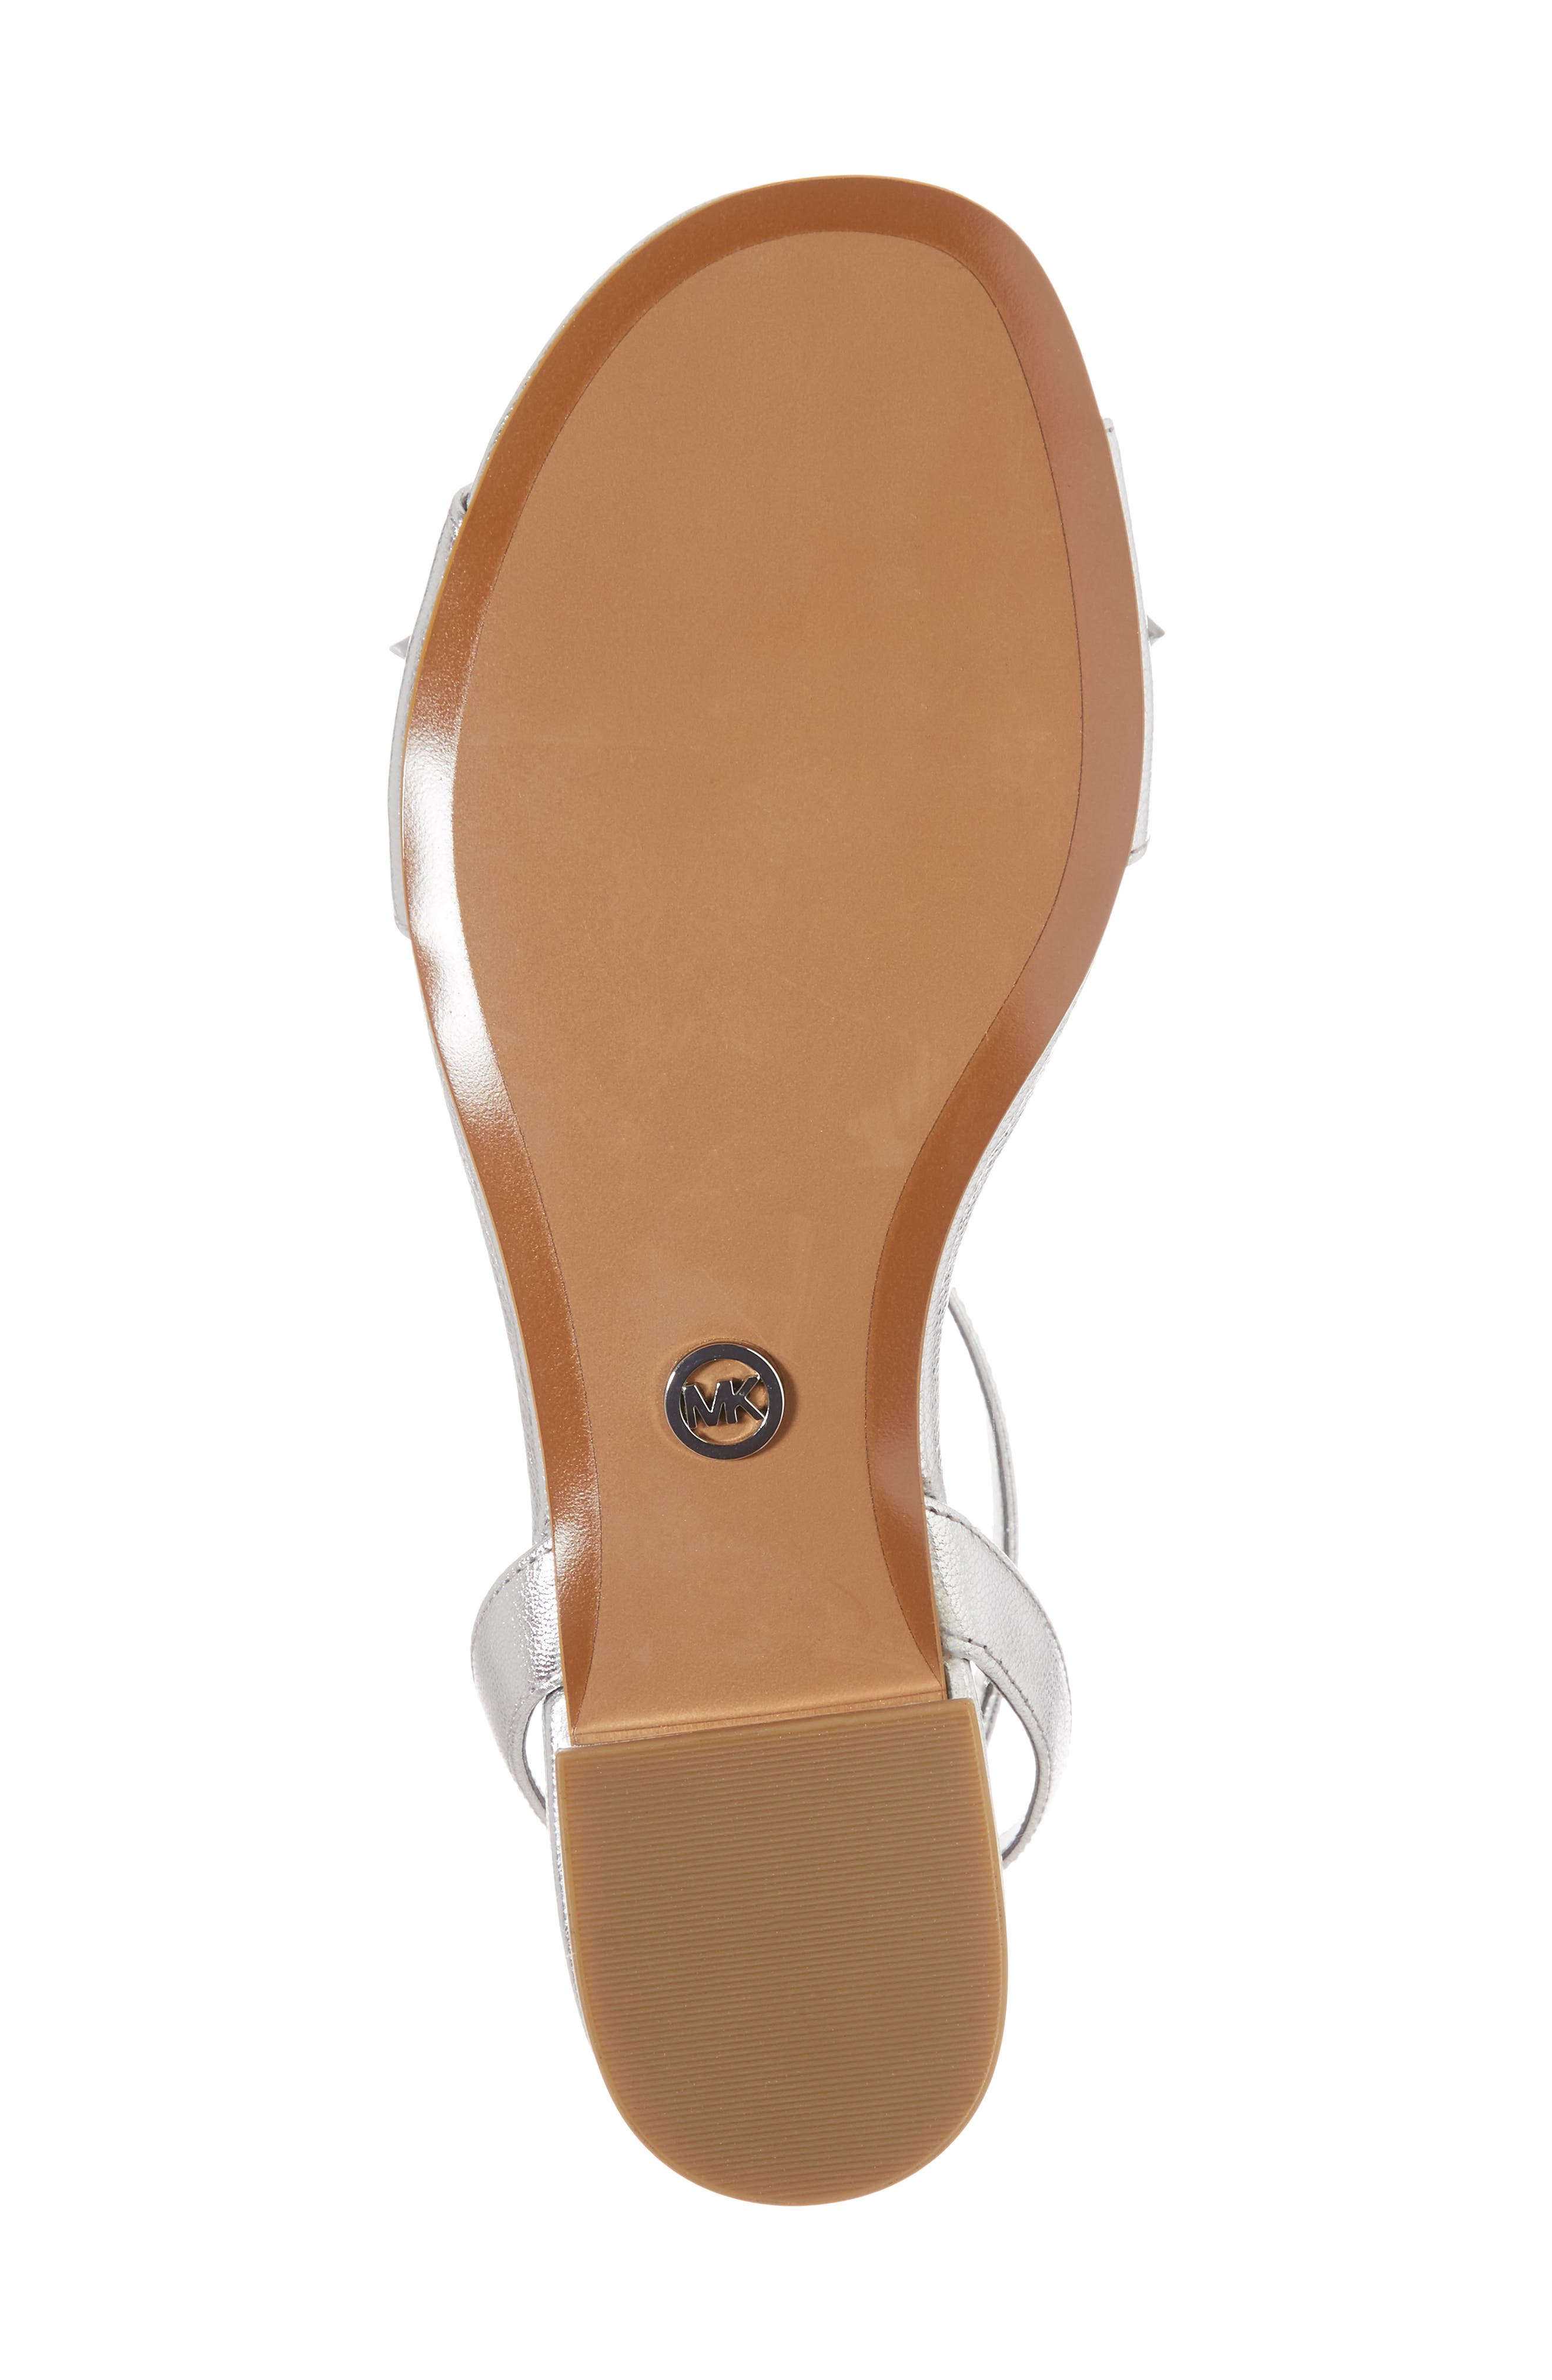 Lexie Star Embellished Sandal,                             Alternate thumbnail 6, color,                             040